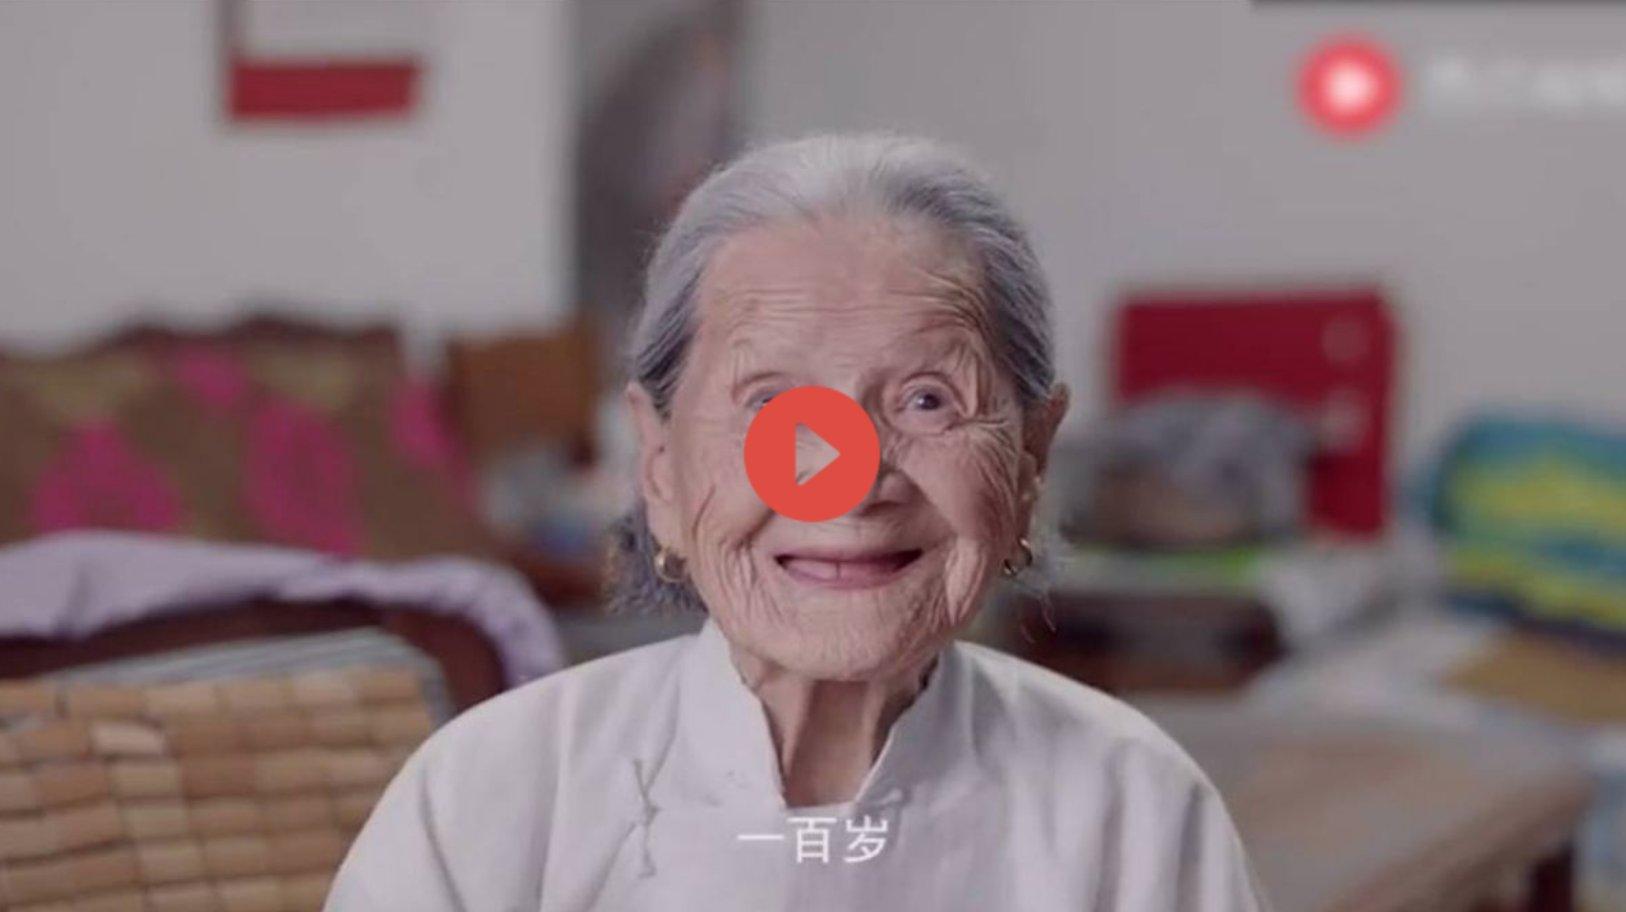 screen shot 2018 10 04 at 3 04 48 pm.png?resize=1200,630 - 120秒紀錄女性1-100歲變化...網友鼻酸感嘆:「這就是人生啊~」